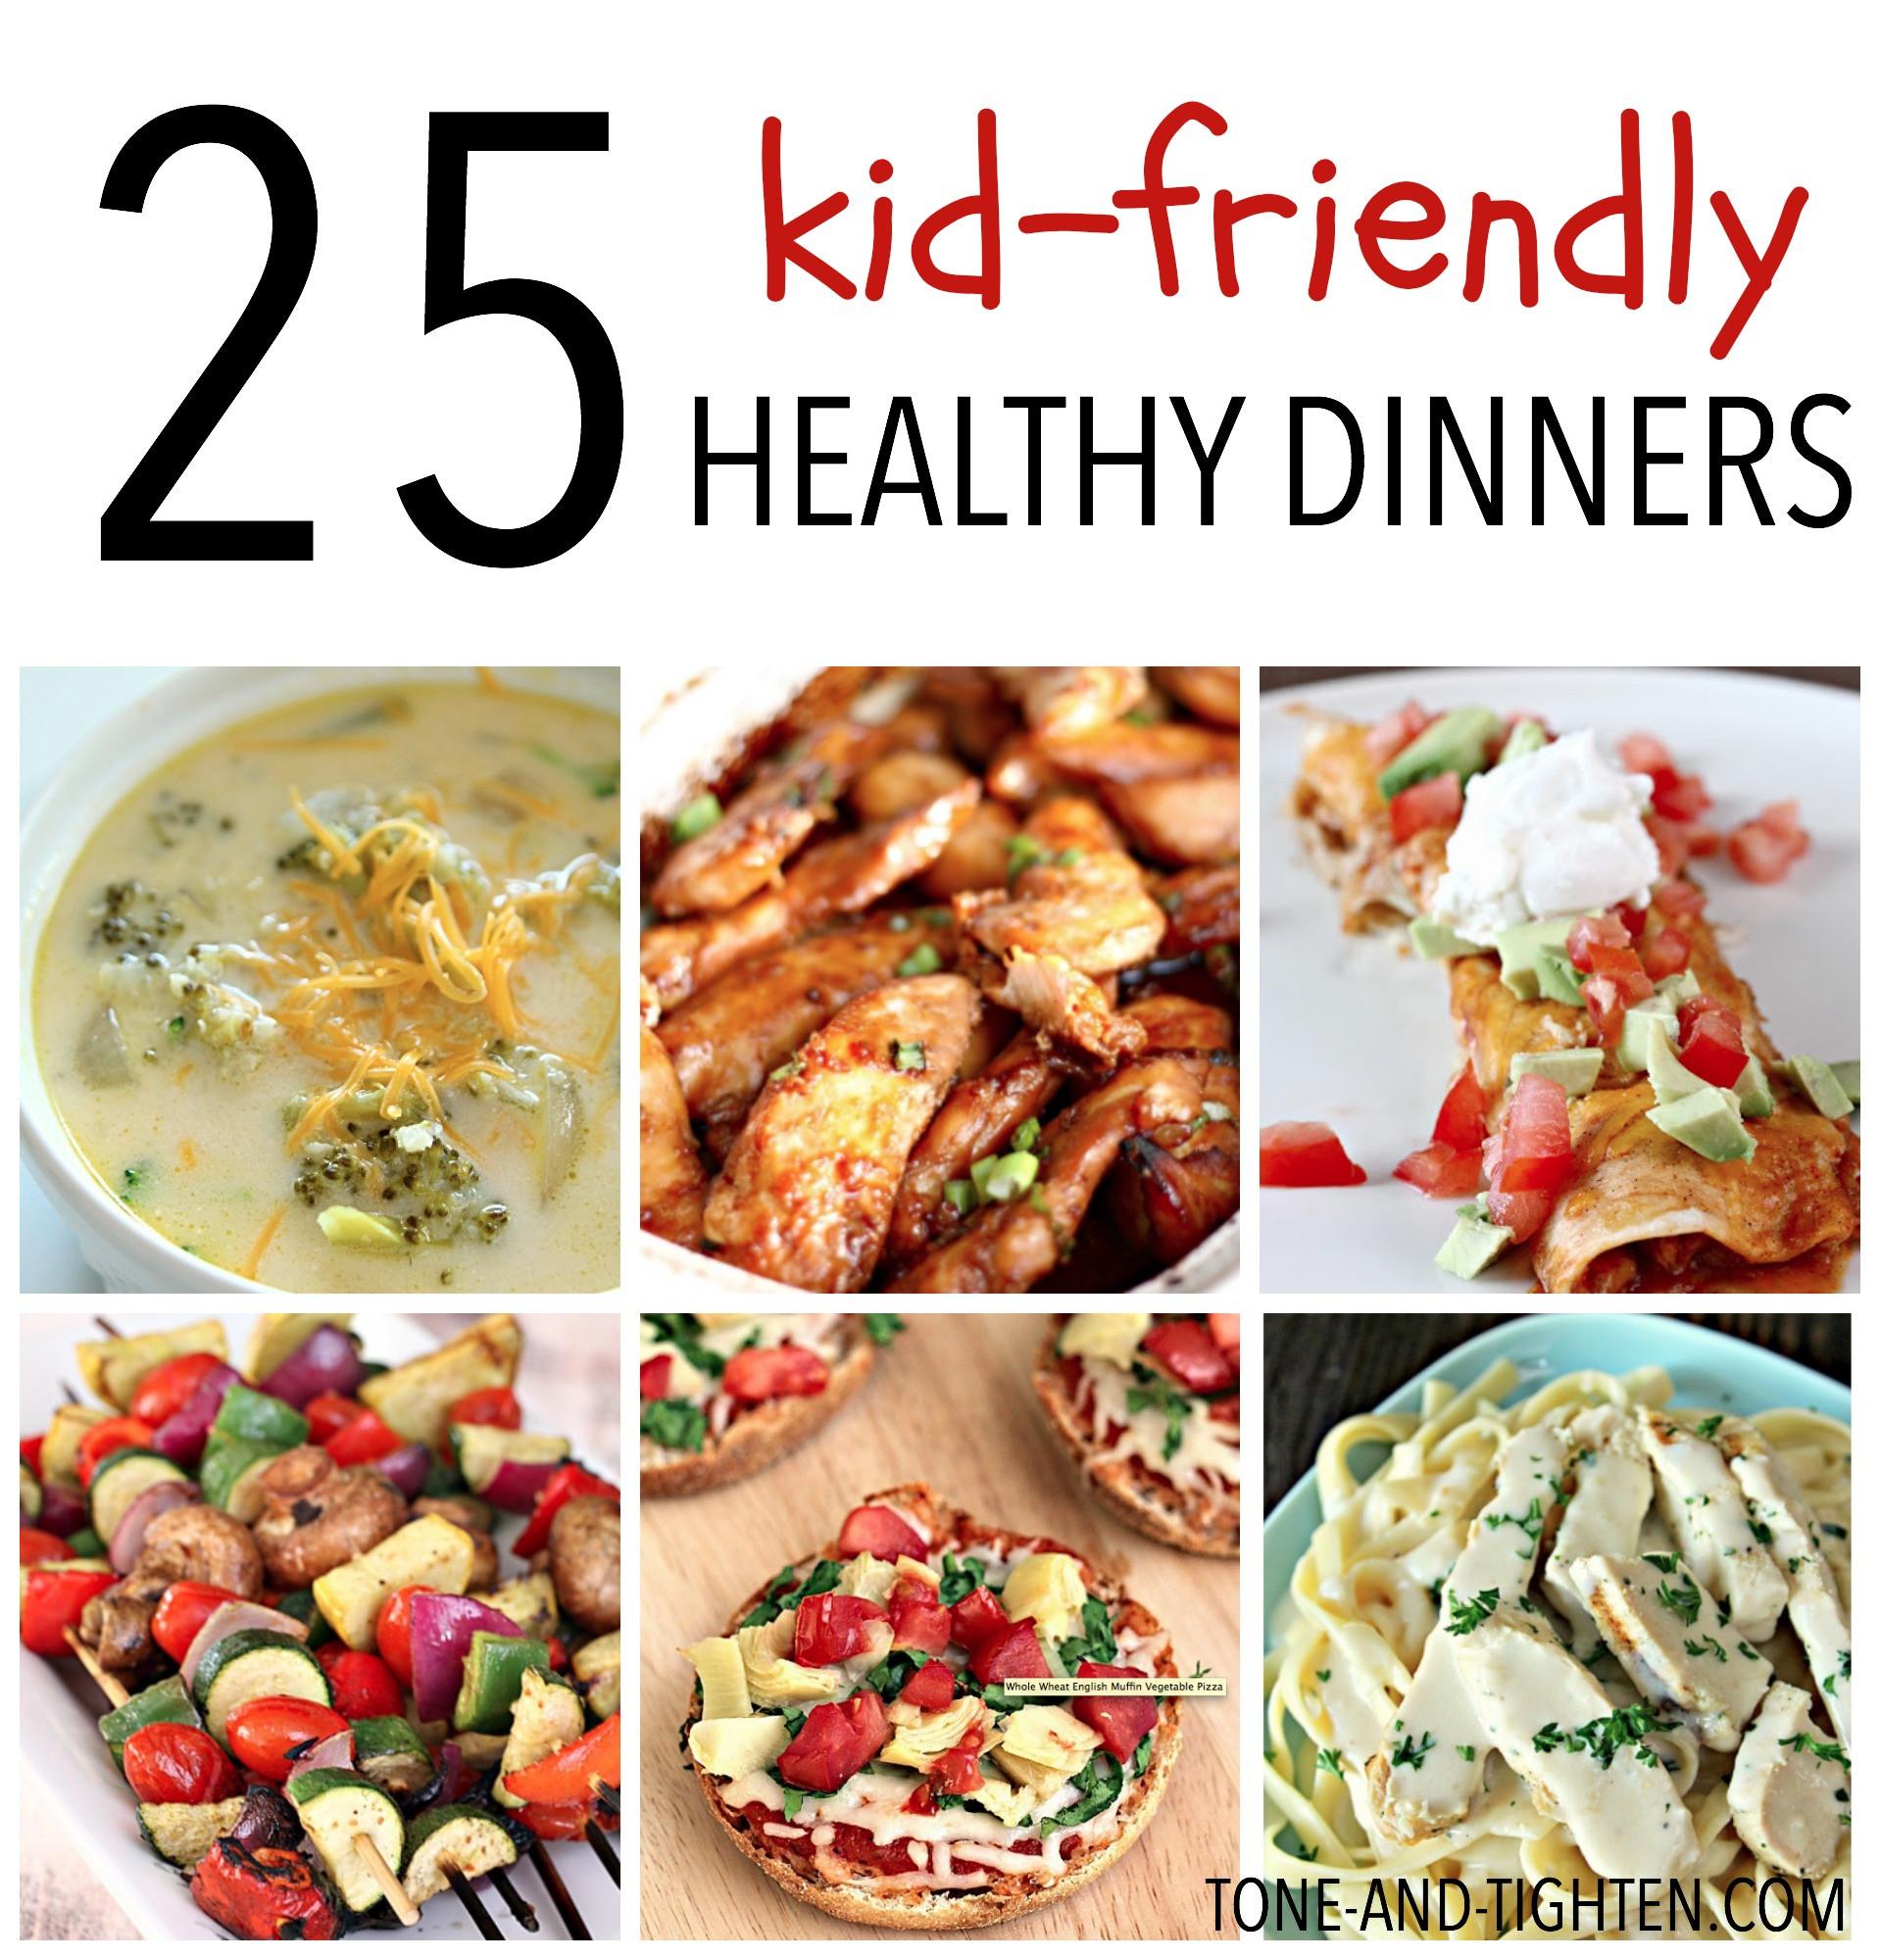 Healthy Kid Friendly Dinners  25 Kid Friendly Healthy Dinners